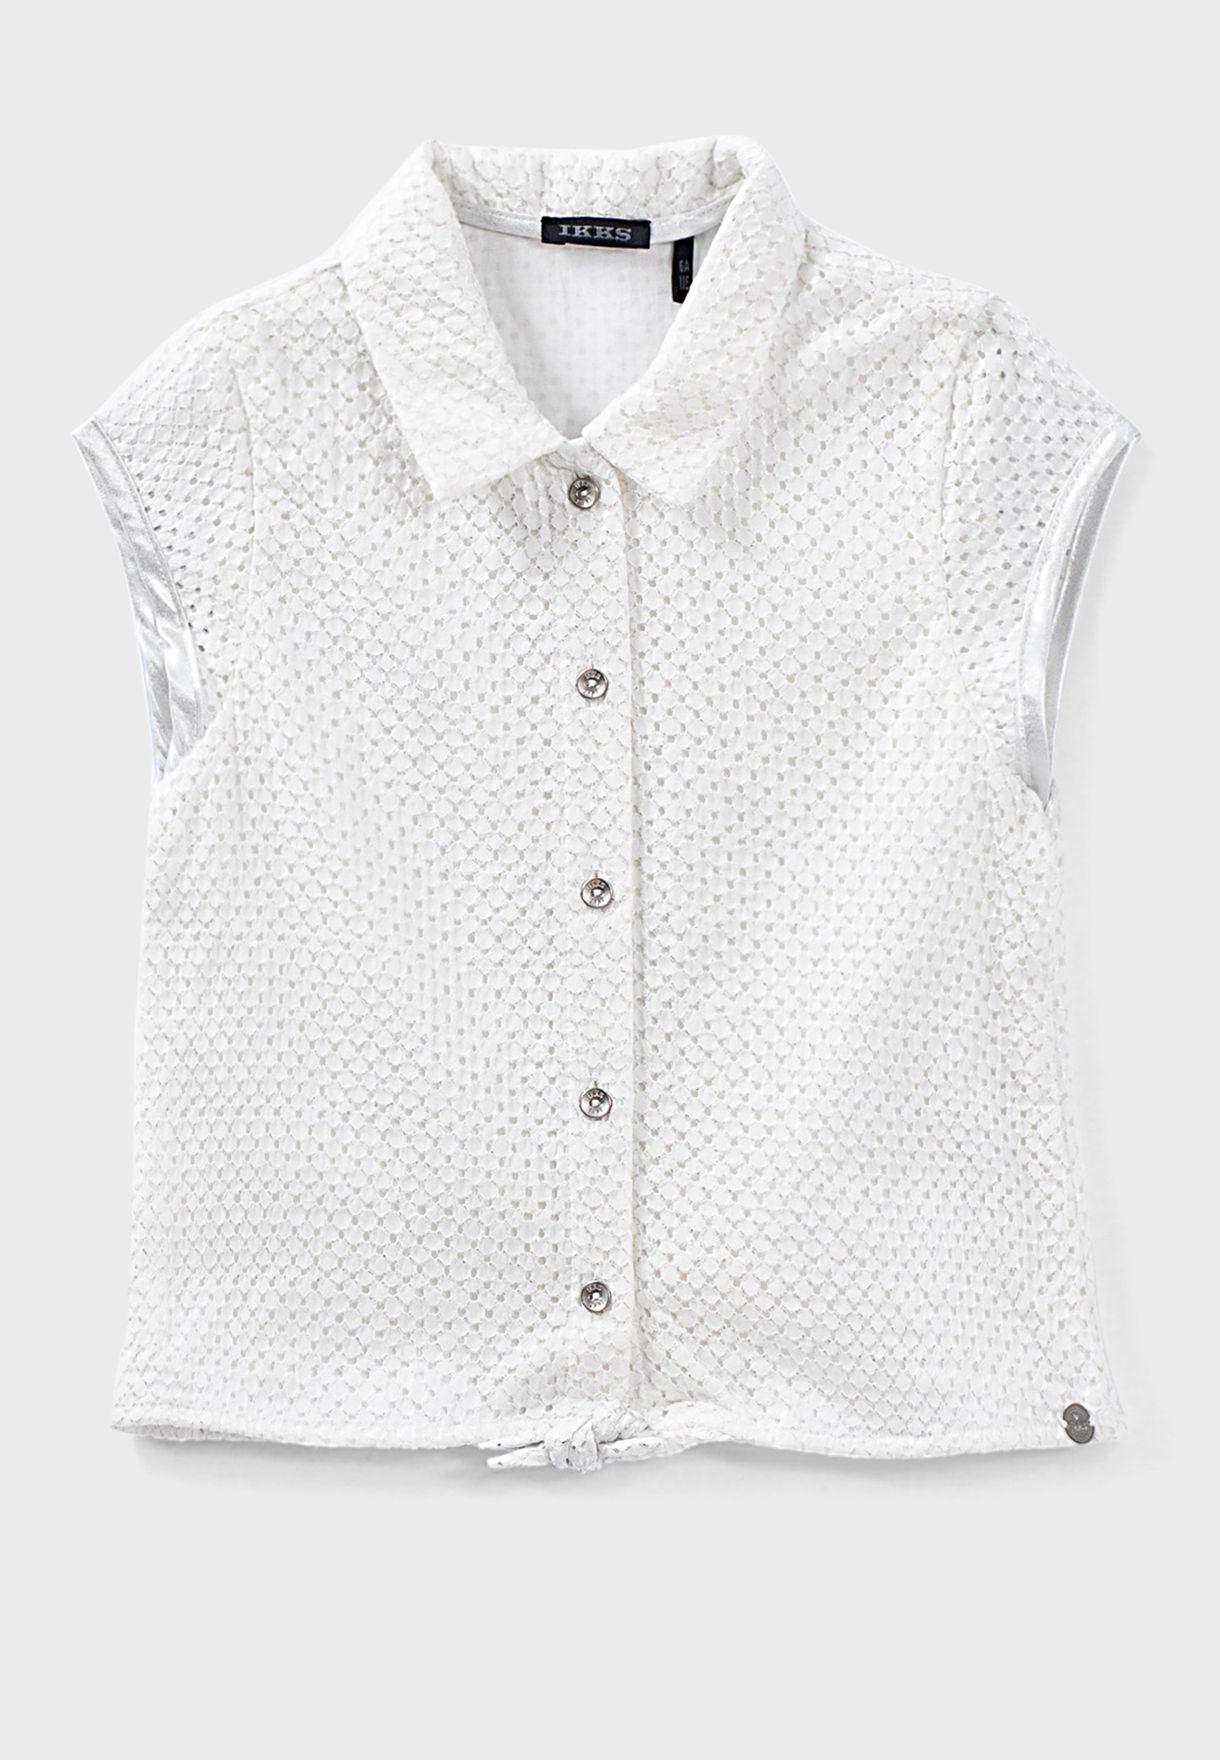 قميص مبطن للاطفال